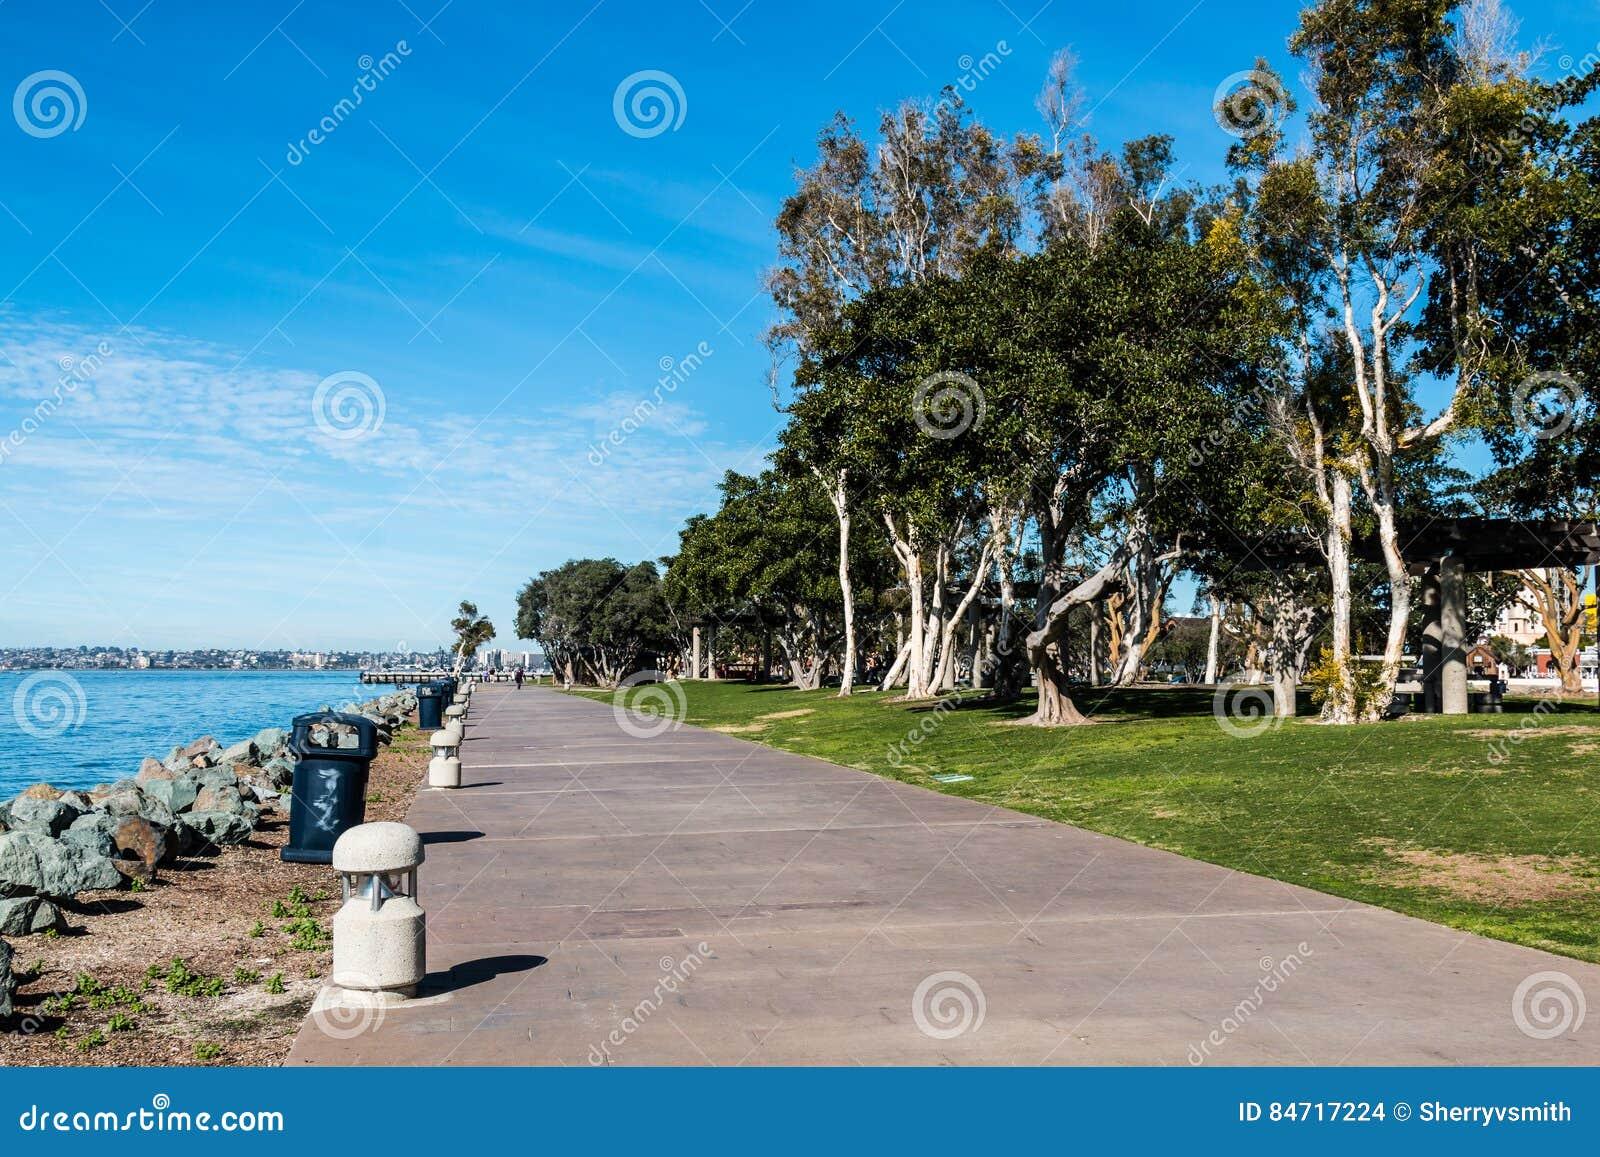 Bayside走道通过Embarcadero北部小游艇船坞的公园